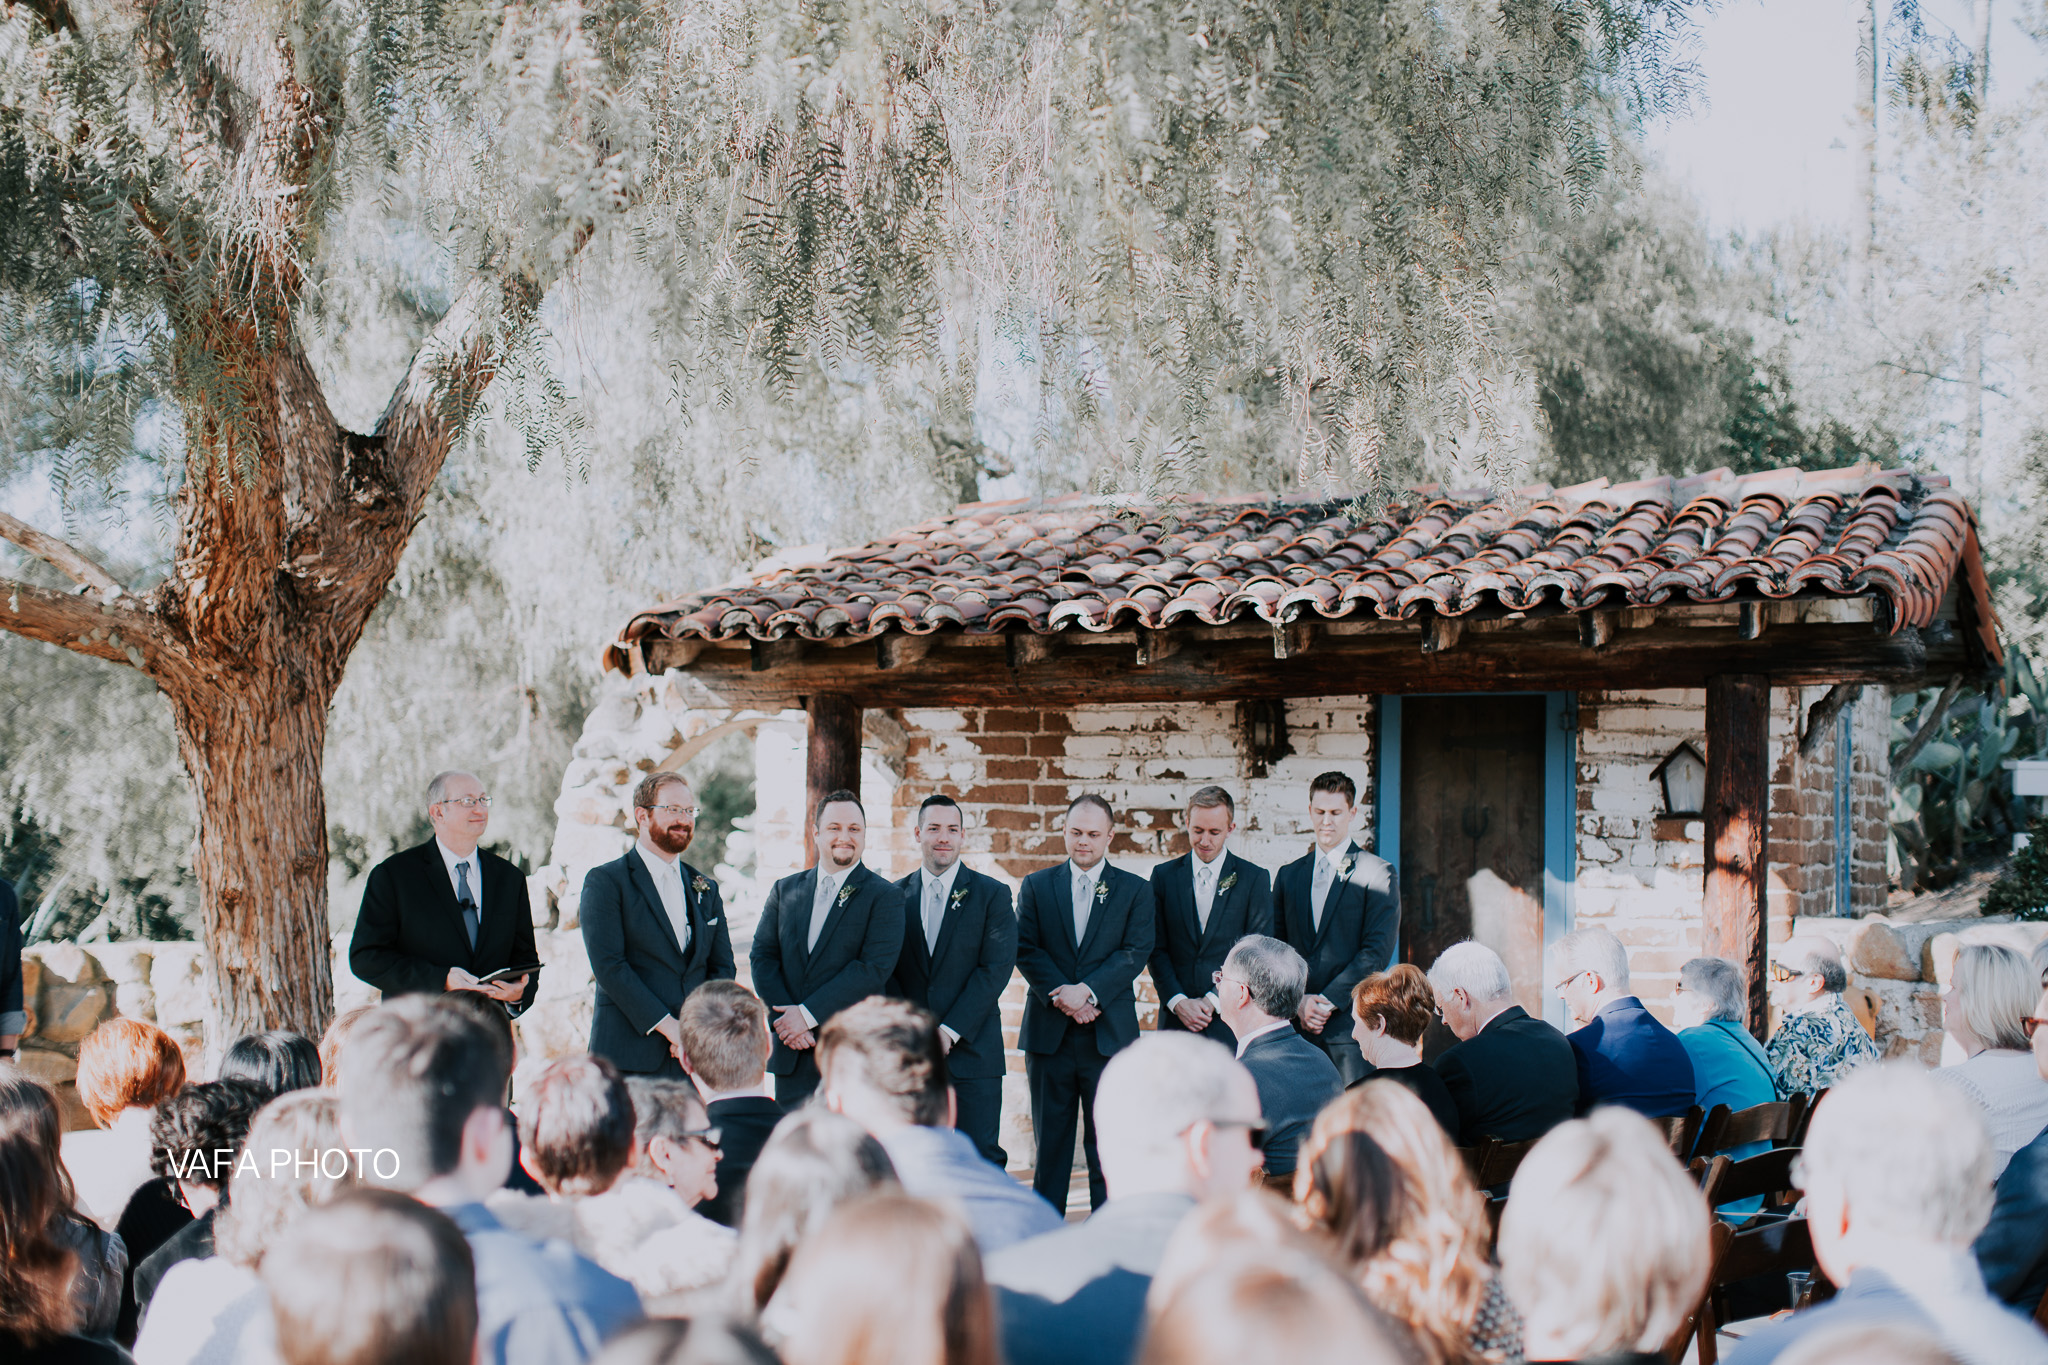 Leo-Carrillo-Ranch-Wedding-Lauren-Mike-Vafa-Photo-528.jpg